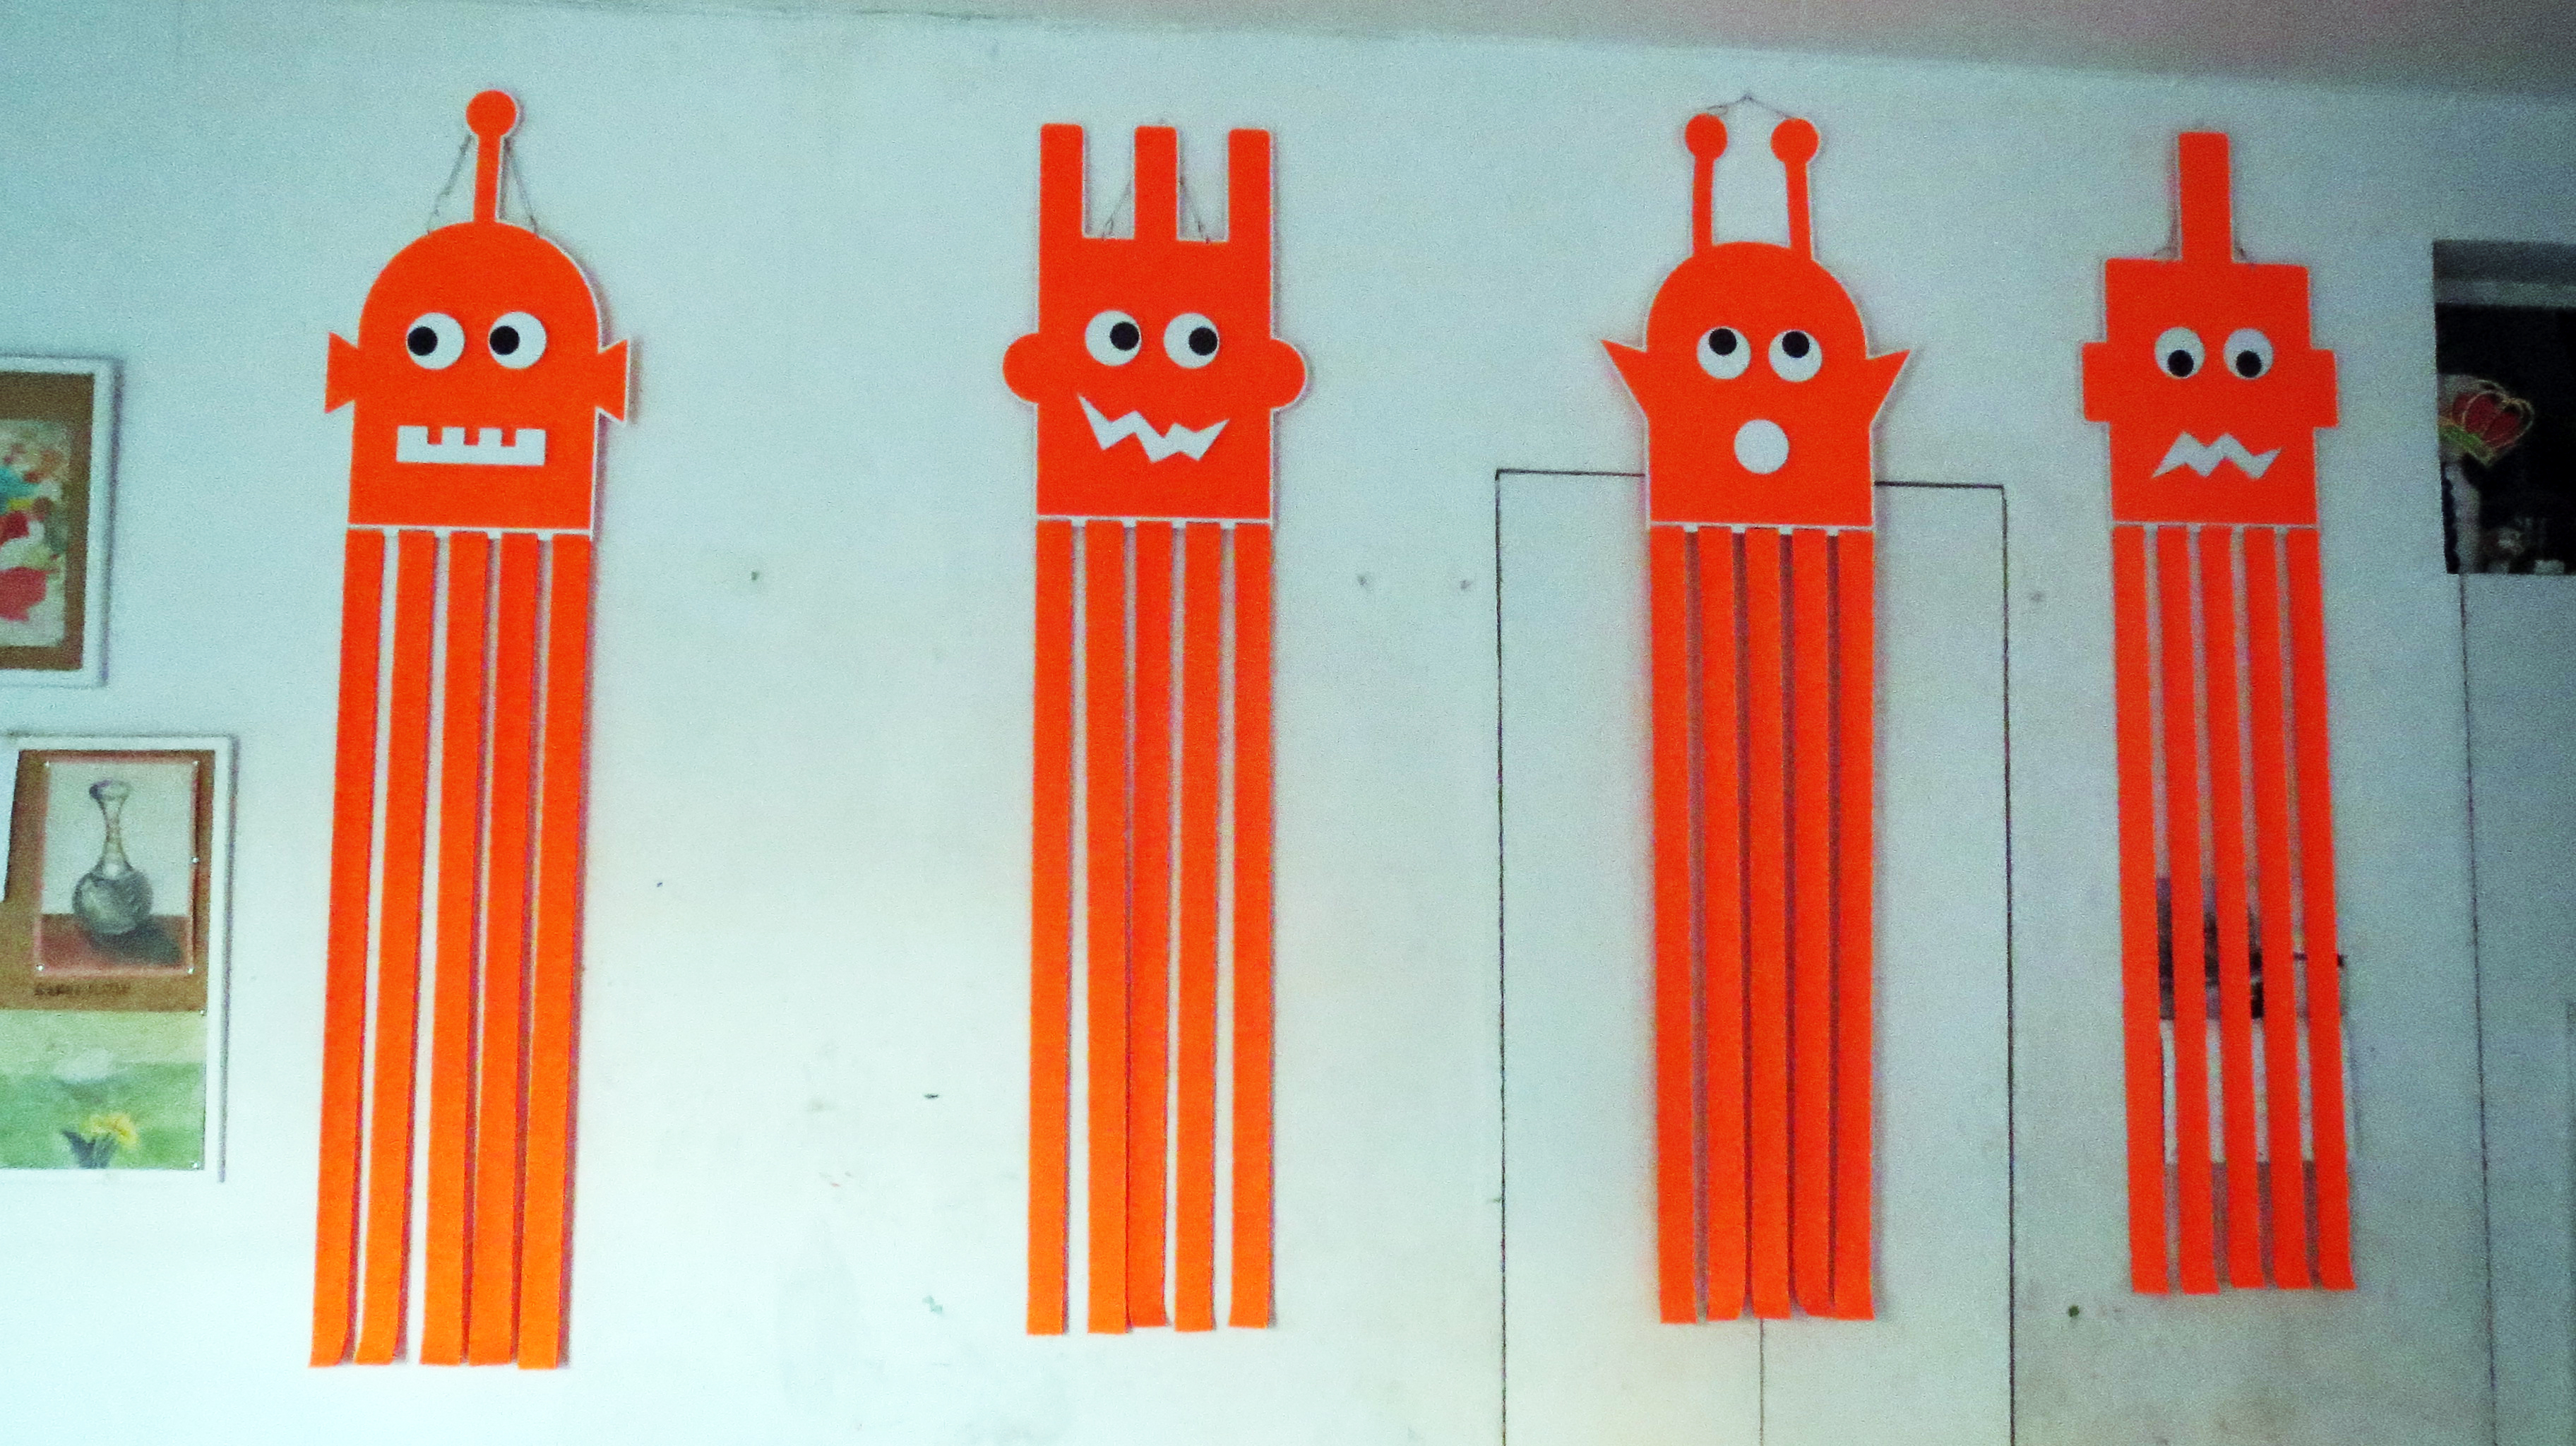 Aula taller infantil arco verde escuela de pintura arco verde madrid - Escuela decoracion madrid ...